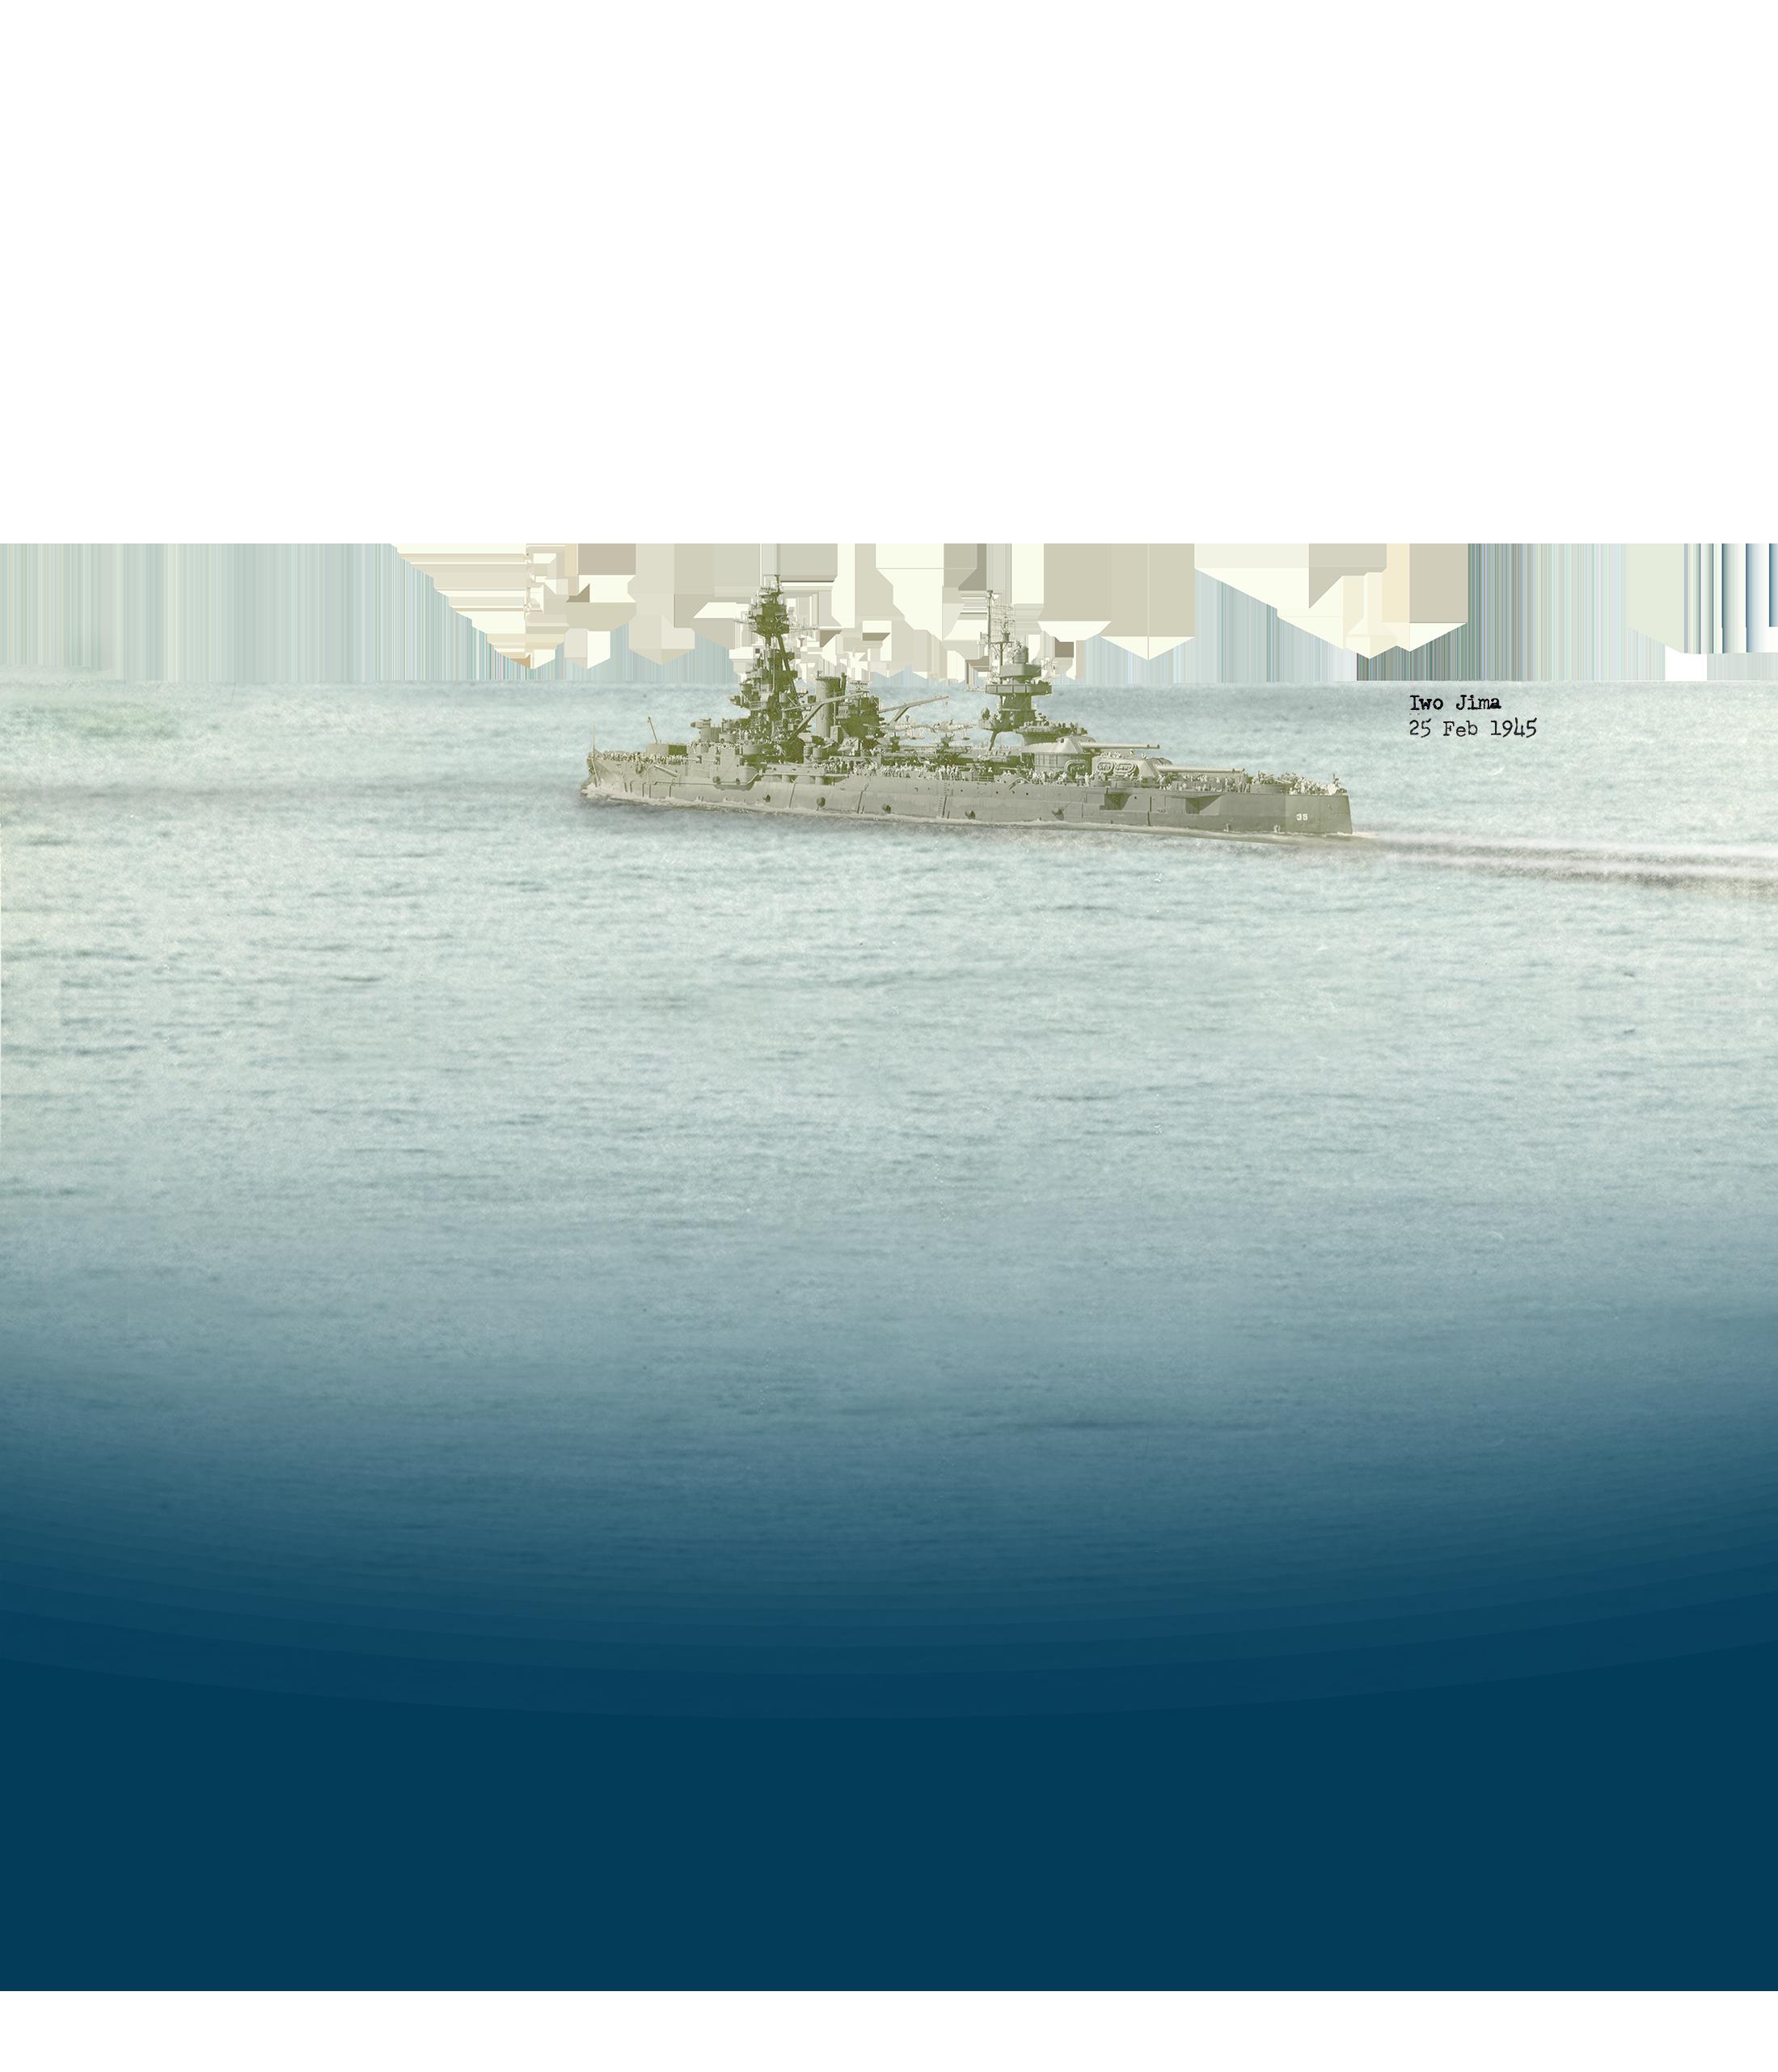 Home the texas foundation. Battleship clipart navy boat